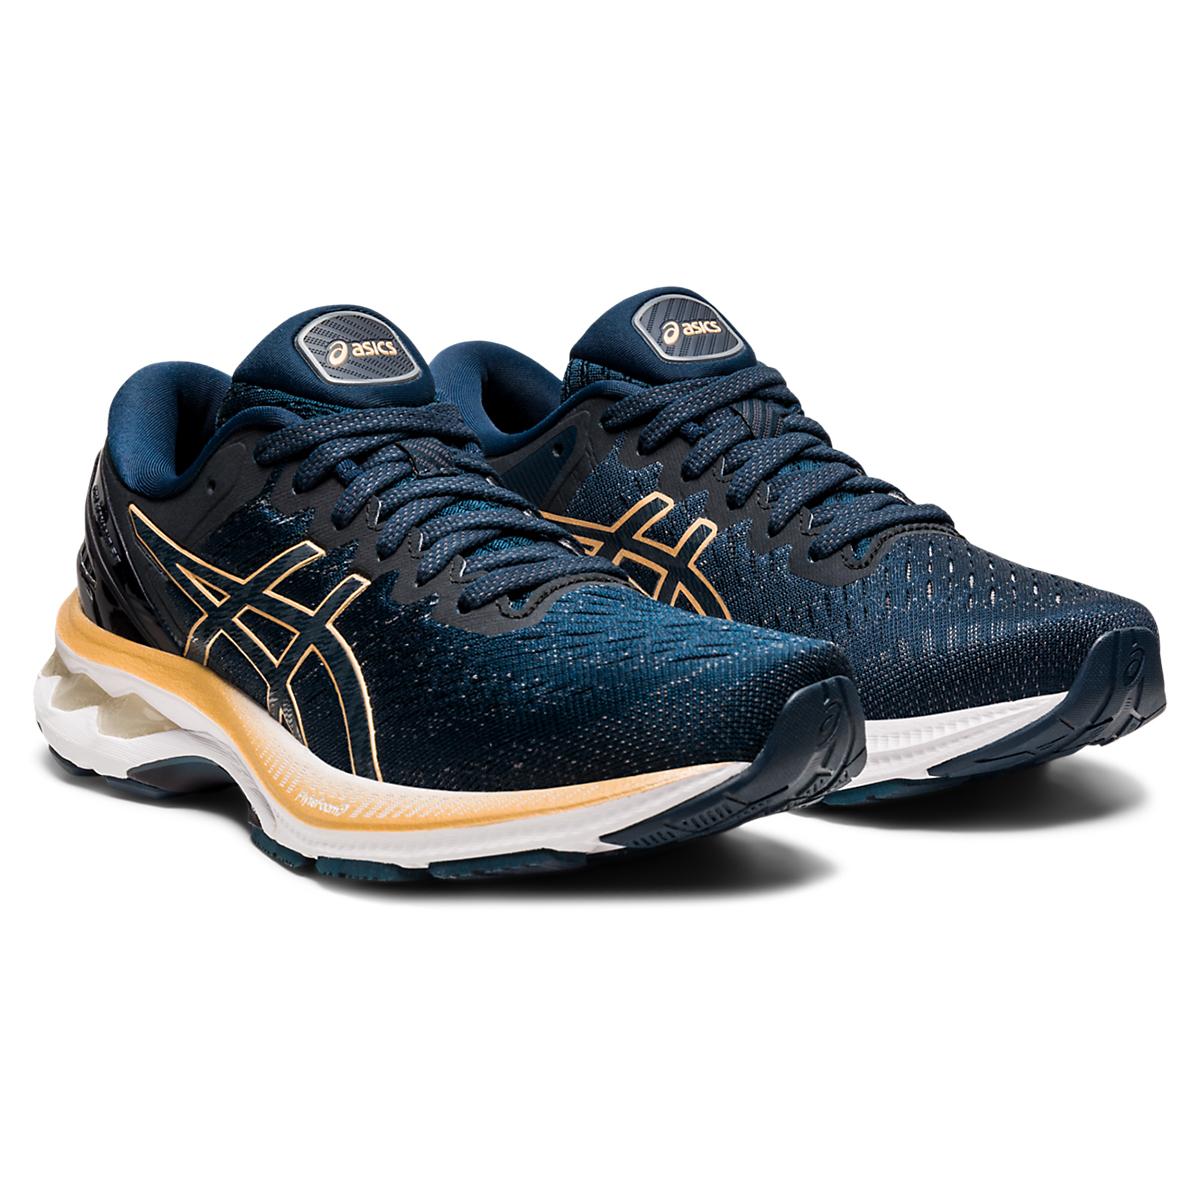 Women's Asics Gel-Kayano 27 Running Shoe - Color: French Blue/Black/Orange - Size: 5 - Width: Regular, French Blue/Black/Orange, large, image 4